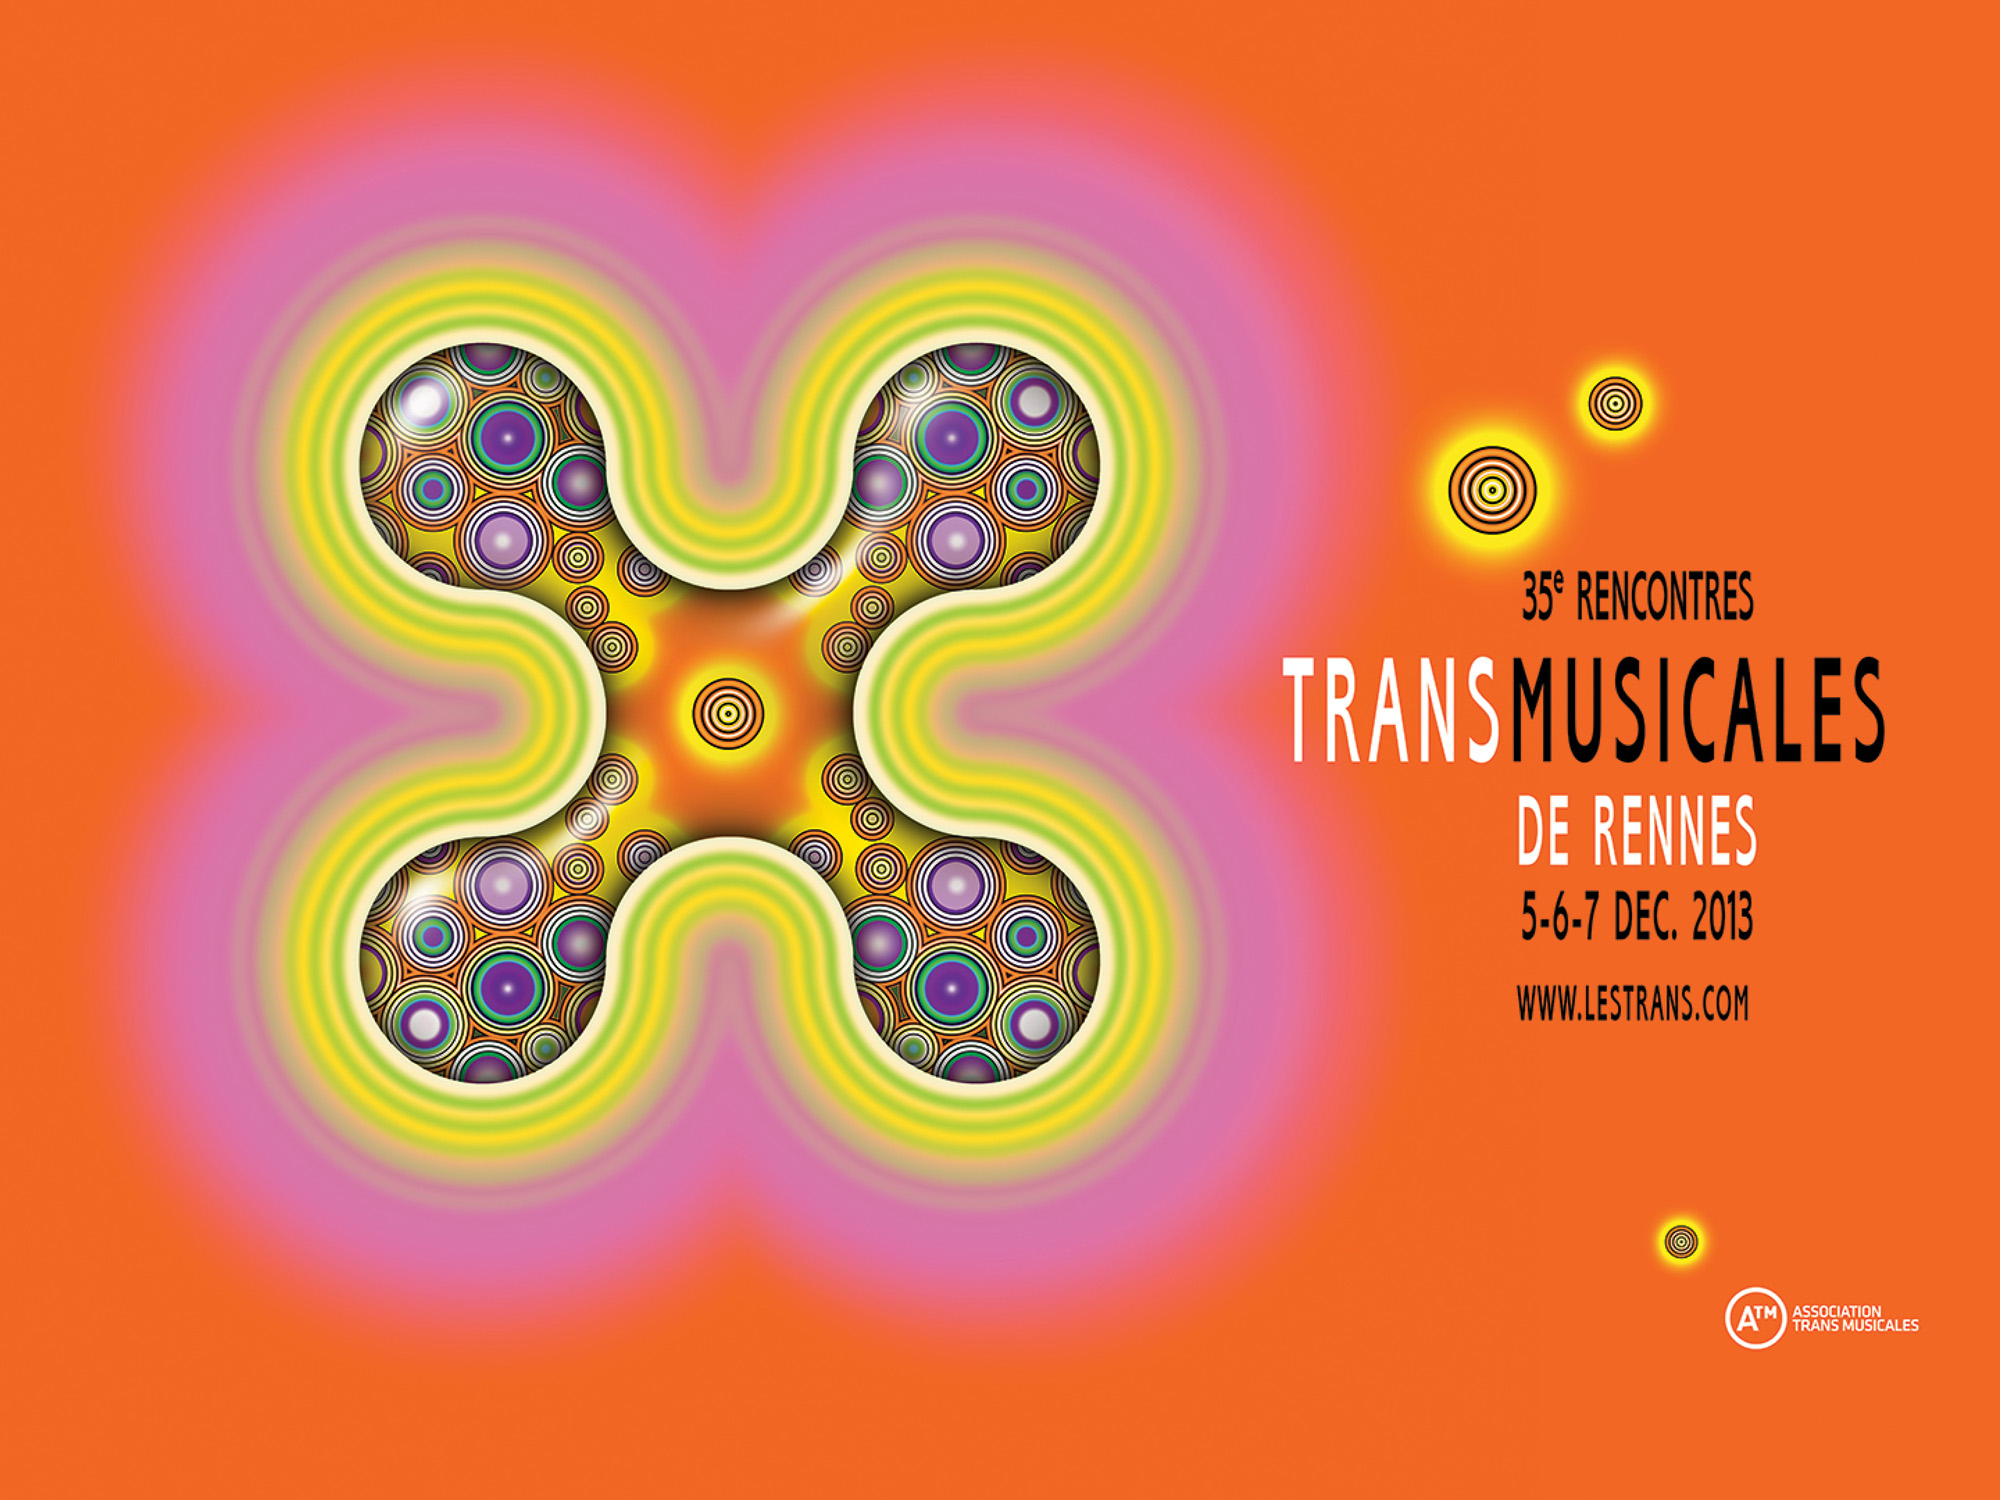 Transmusicales 2013